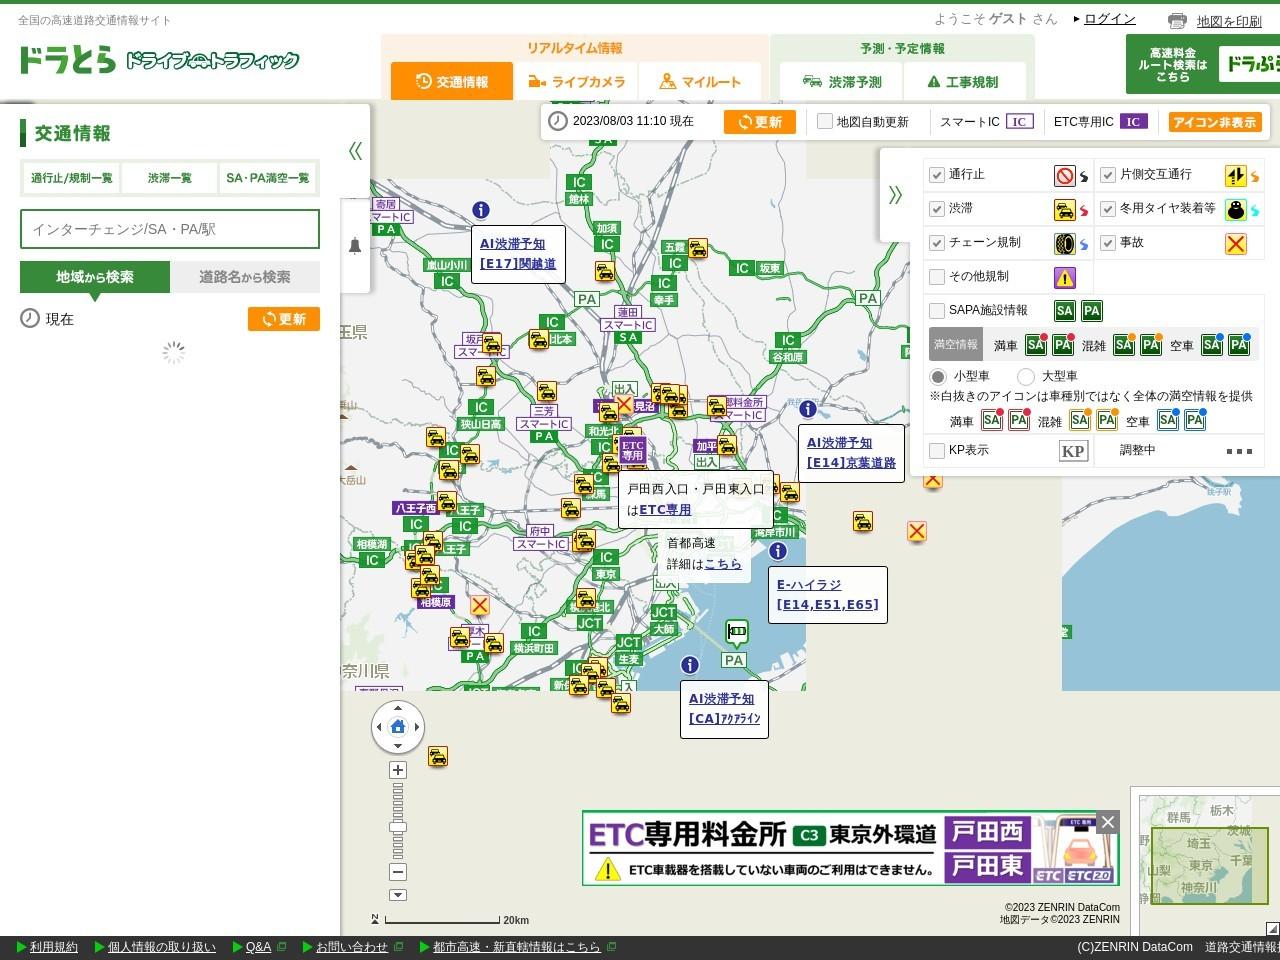 https://www.drivetraffic.jp/congestion?t=p&pmode=cal